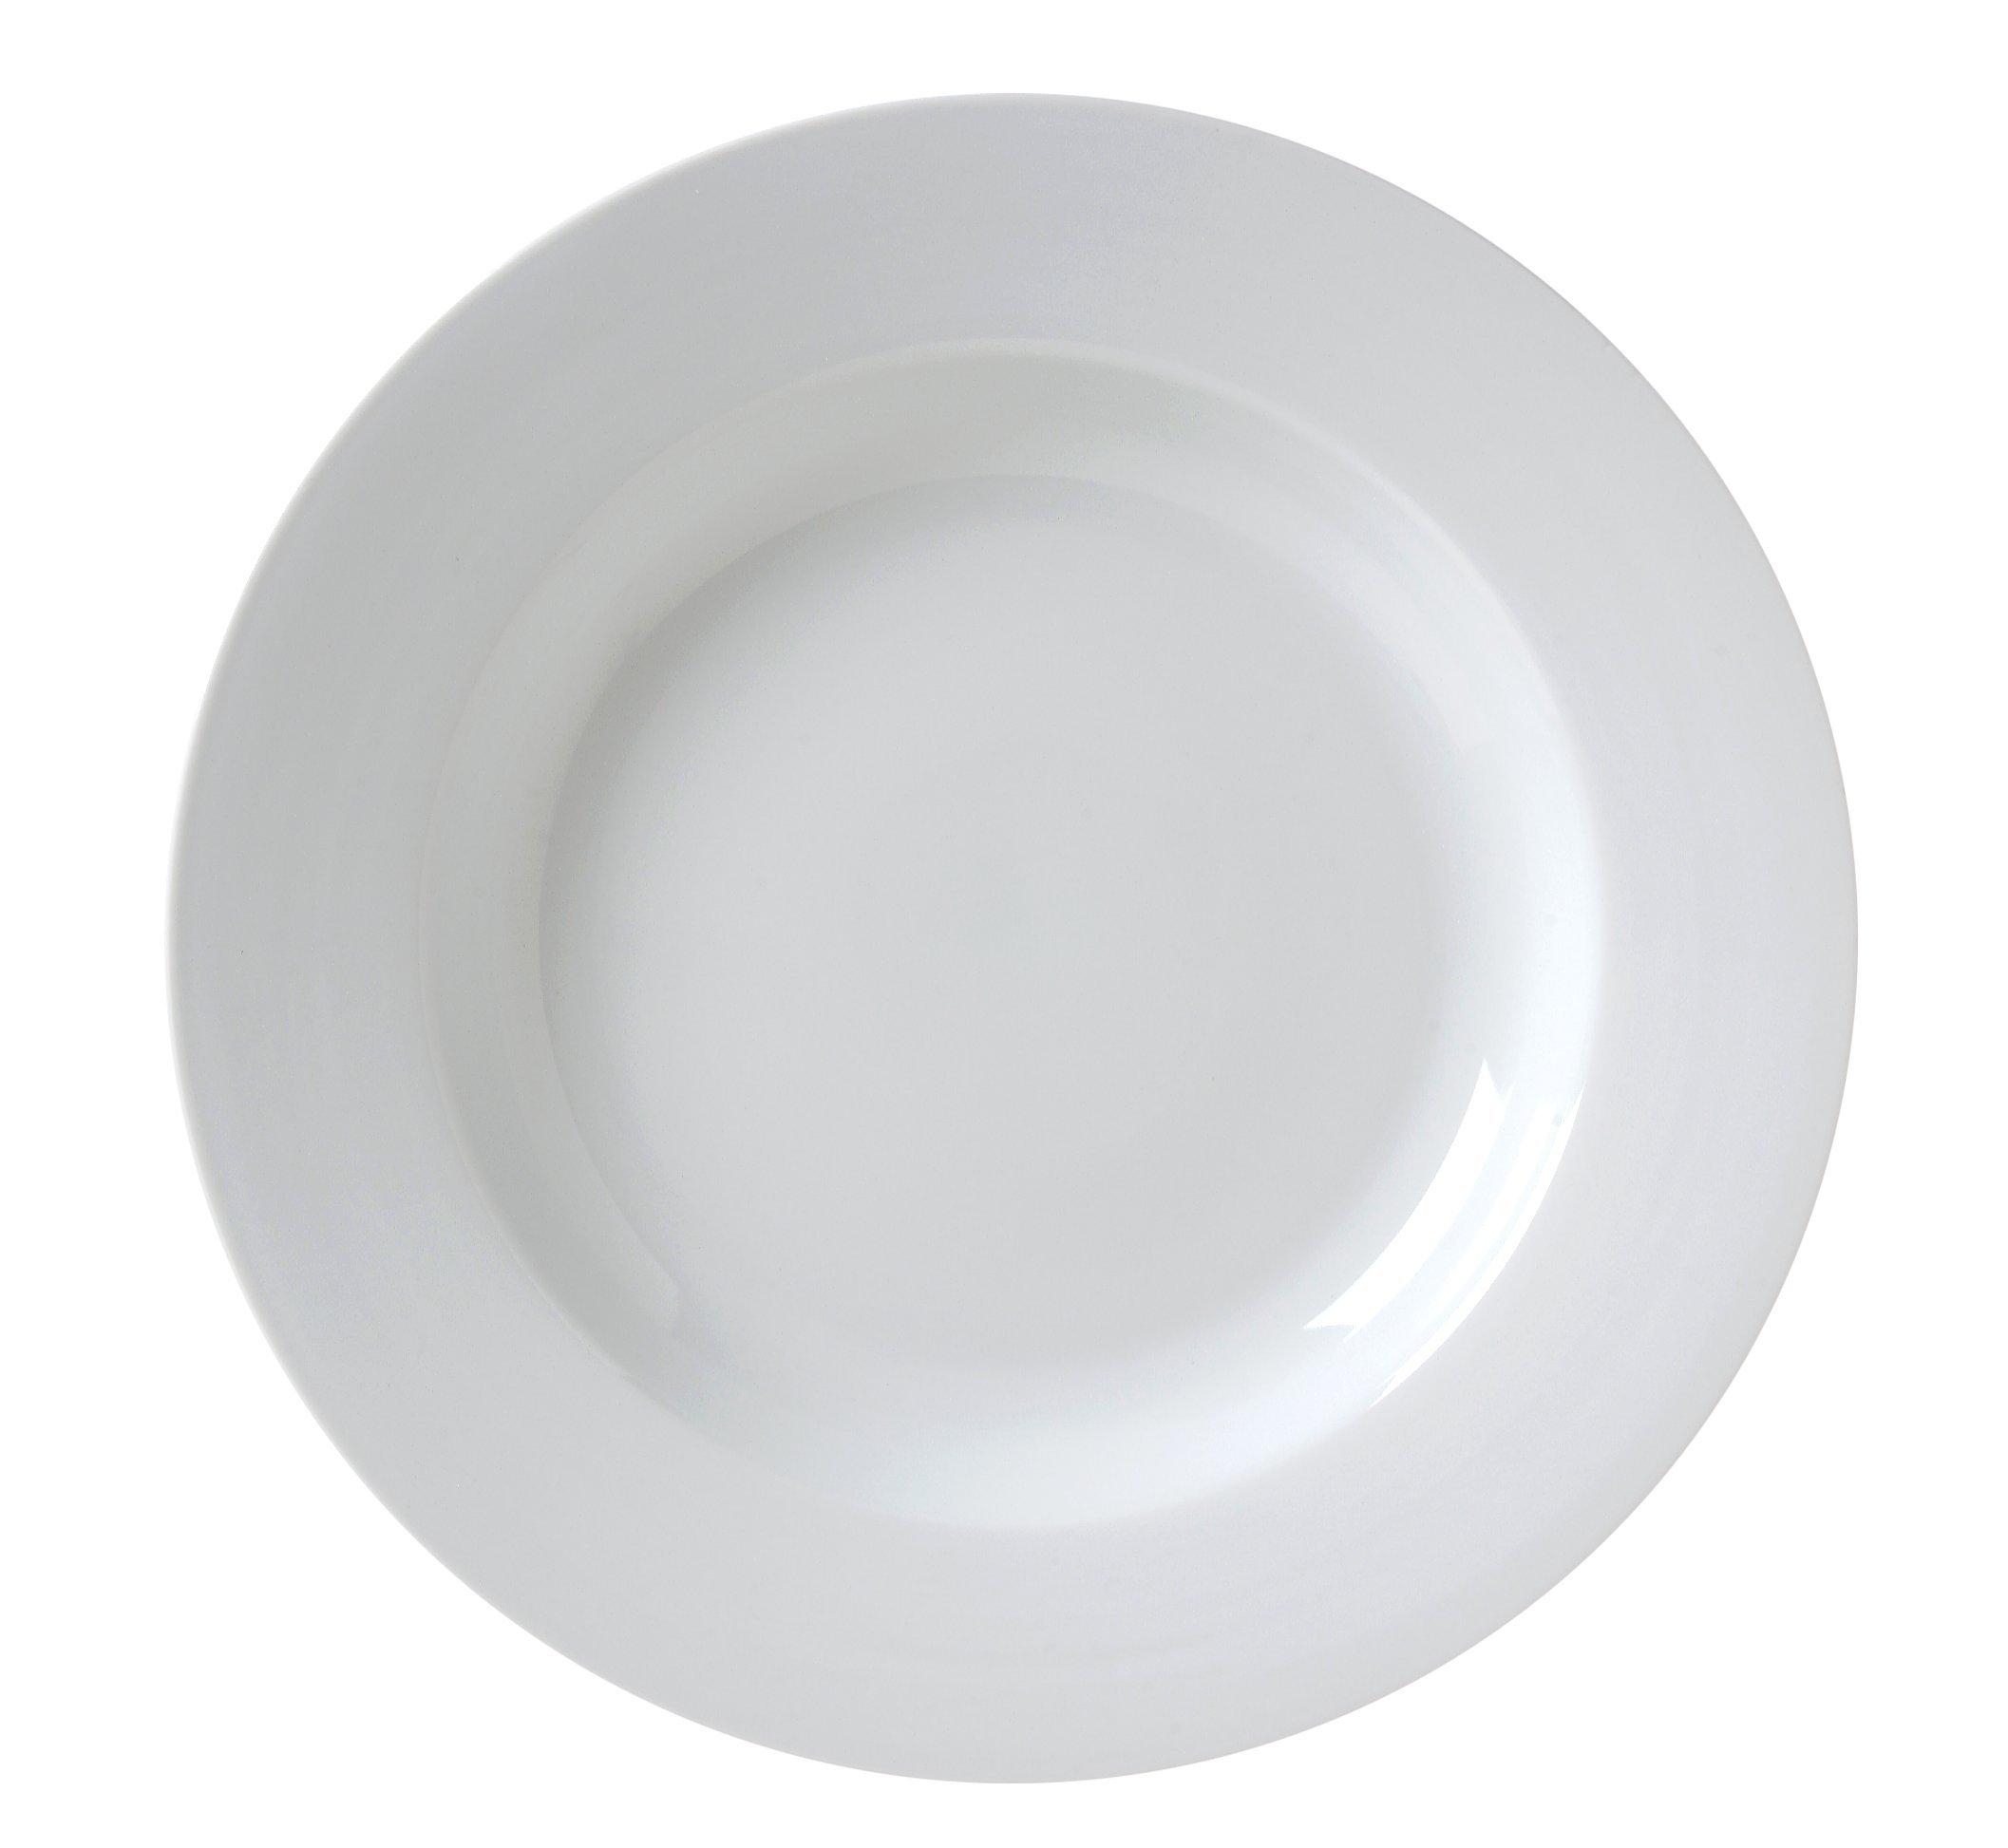 Vertex China CAT-26 Market Buffet Pasta Bowl, 10-1/2'', 18 oz., Porcelain White (Pack of 12)